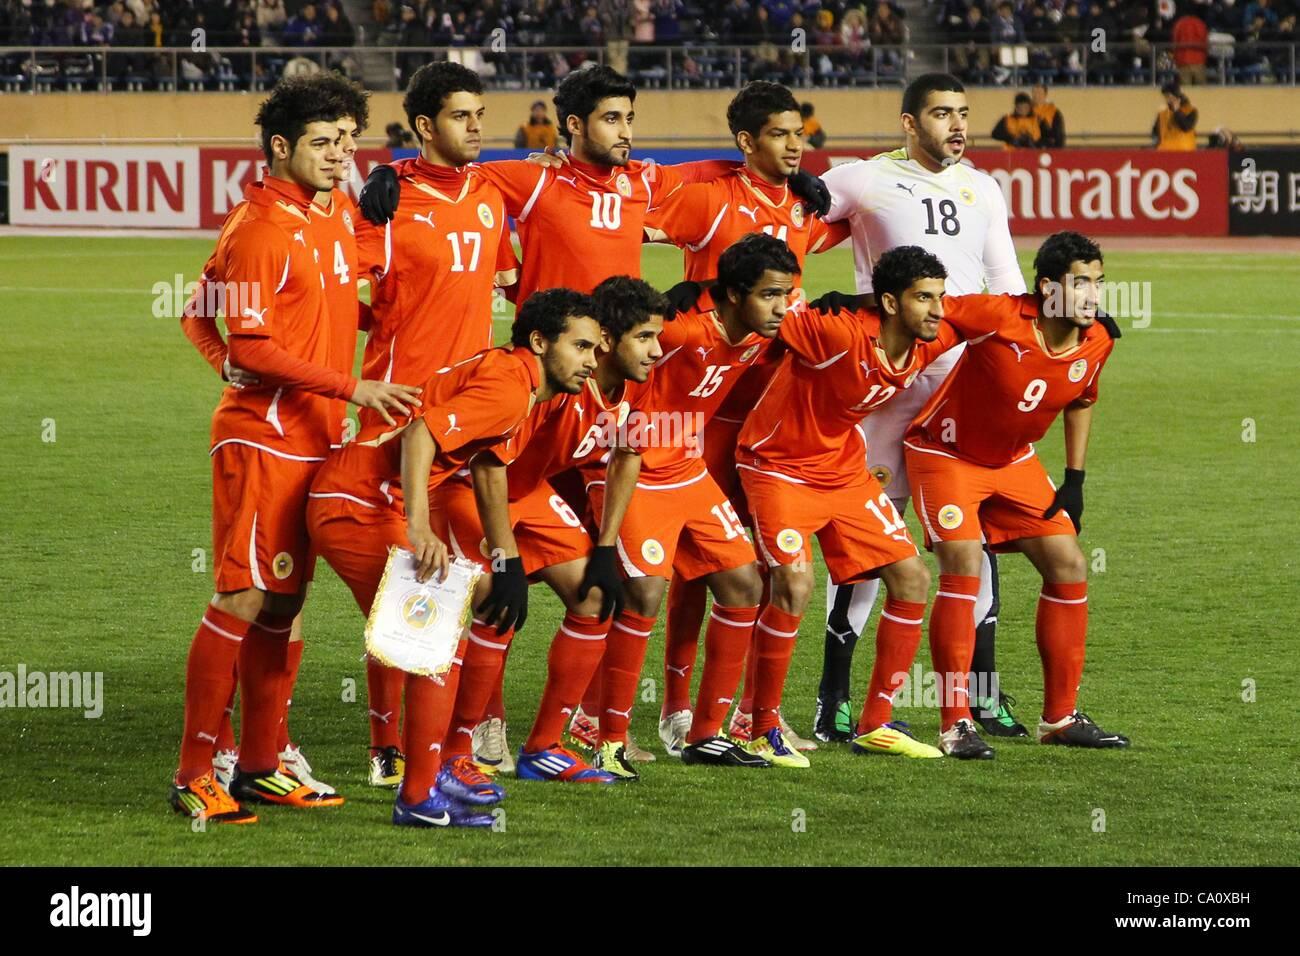 Bahrain National Team Group Line Up Imágenes De Stock   Bahrain ... 65dfd9fdf662a